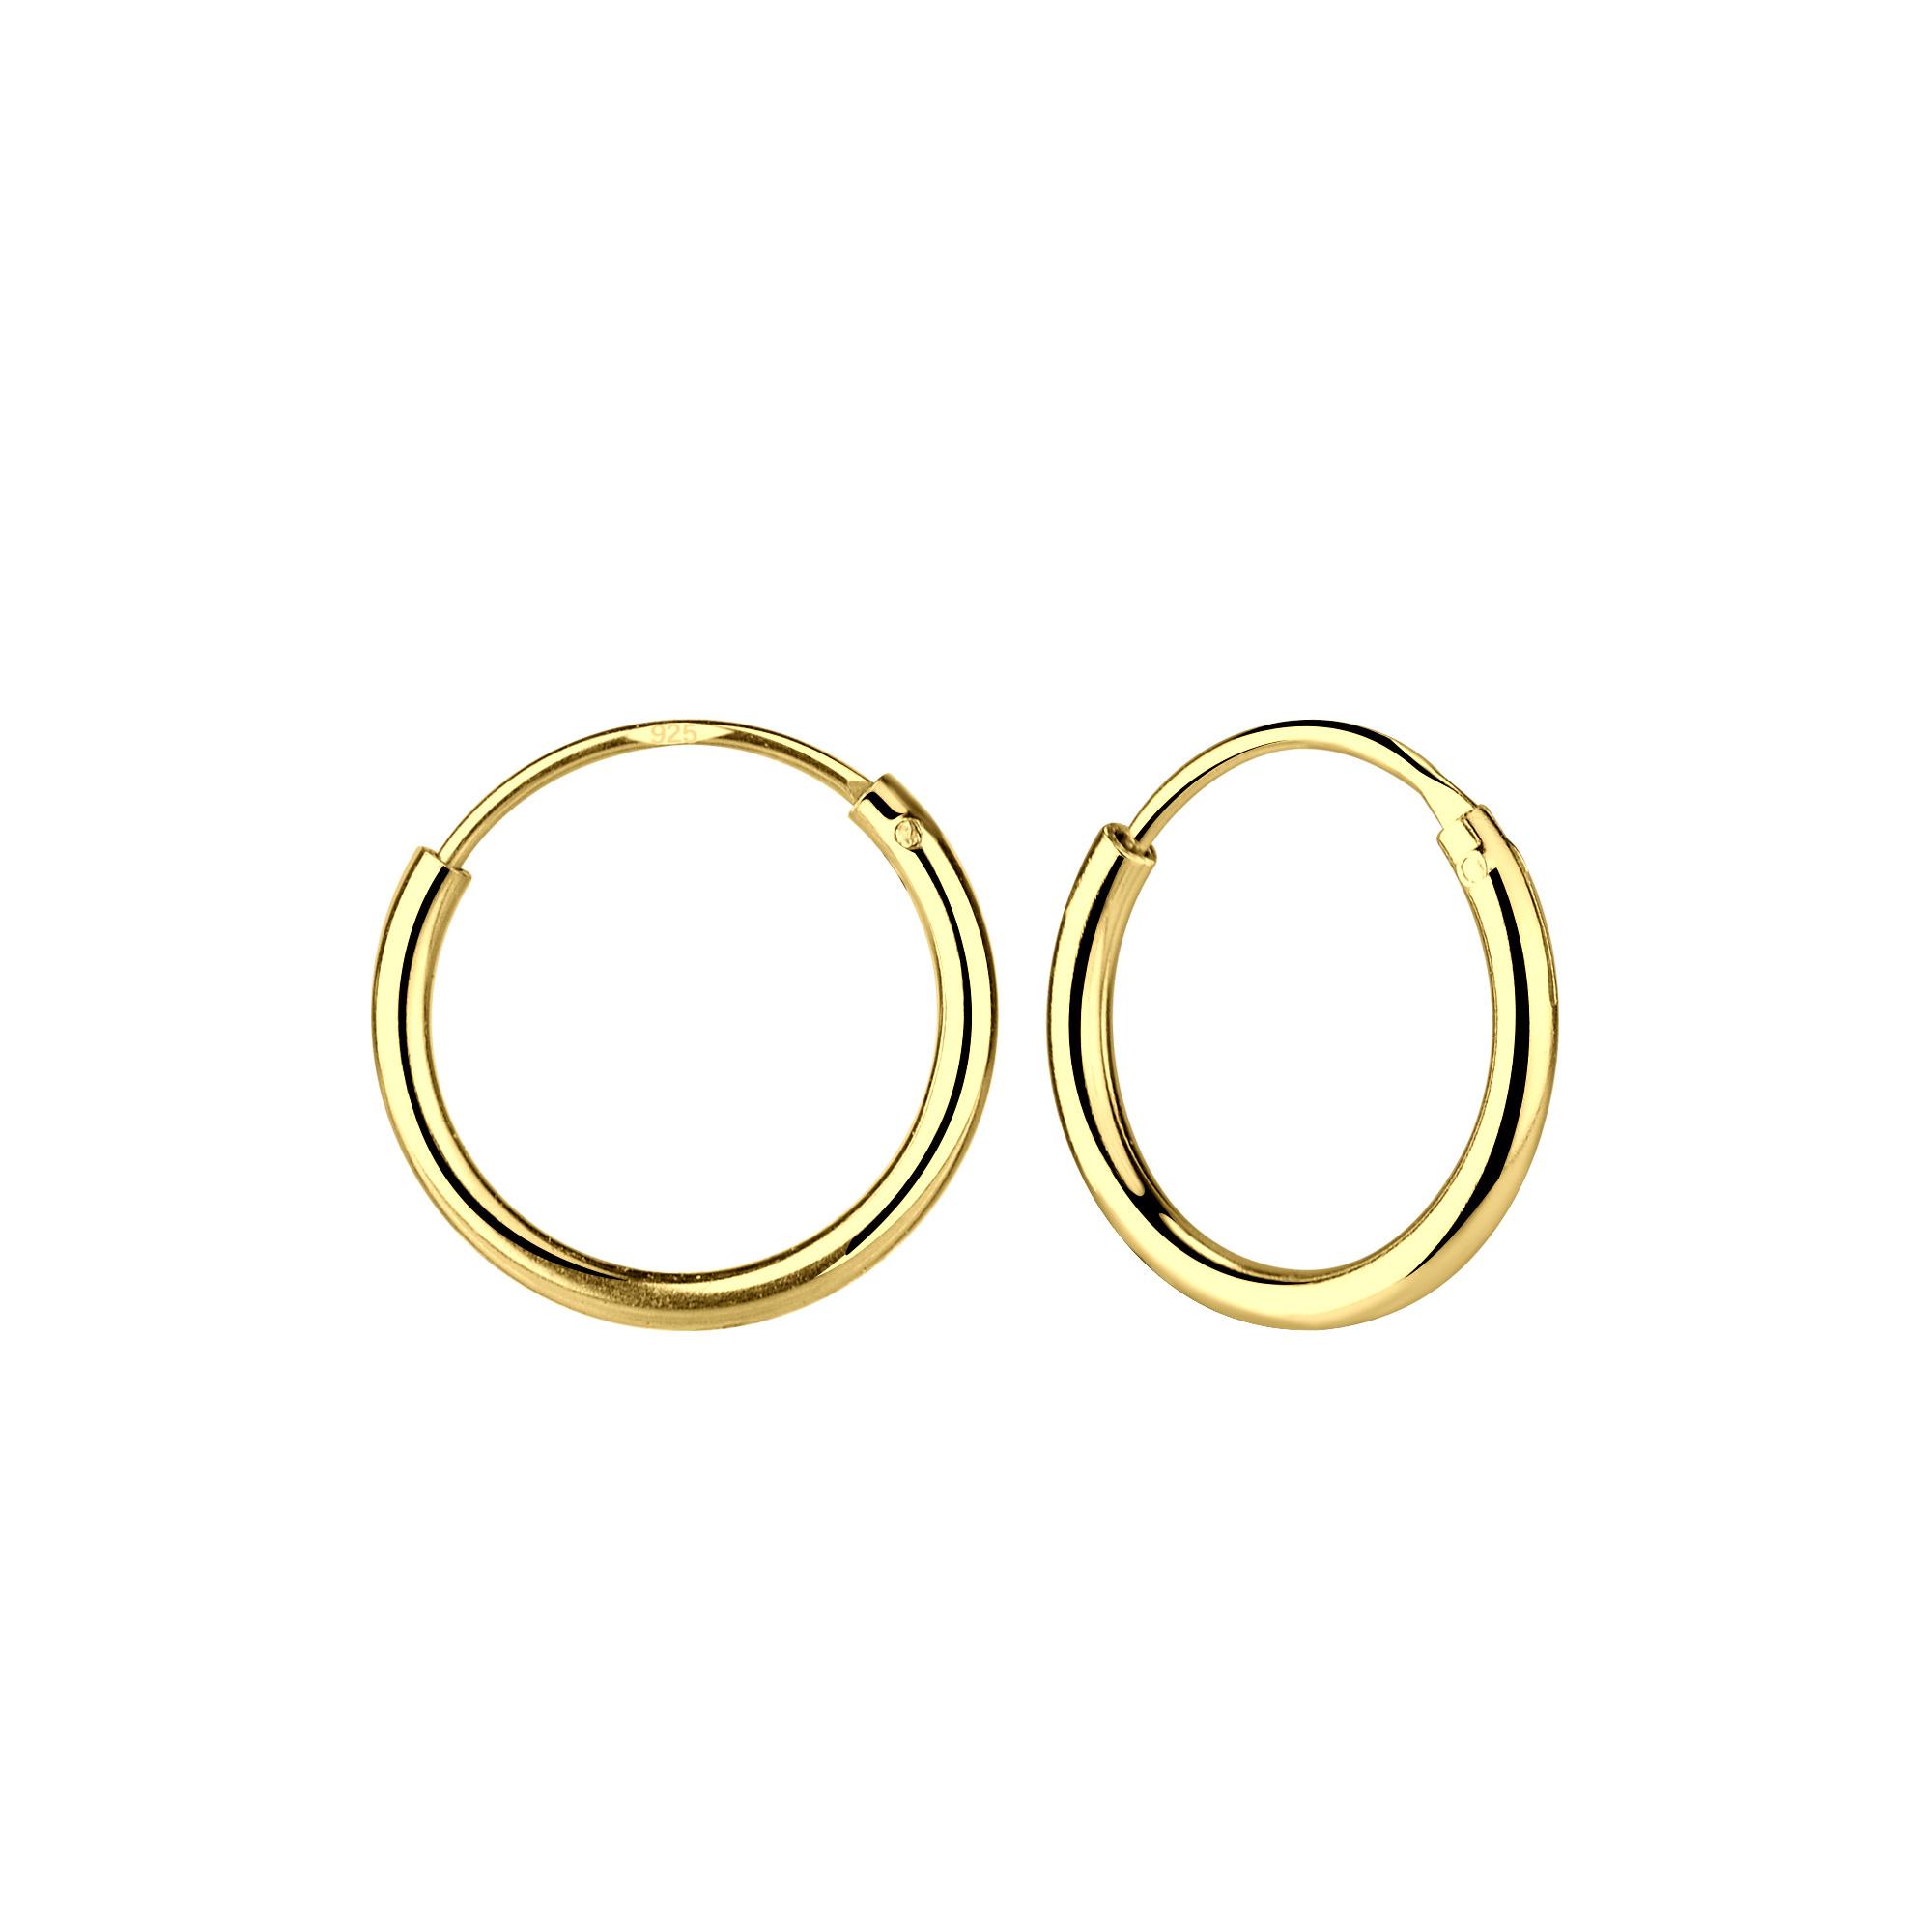 Small Hoop Earrings (10mm) - 925 Sterling Silver - Gold-1